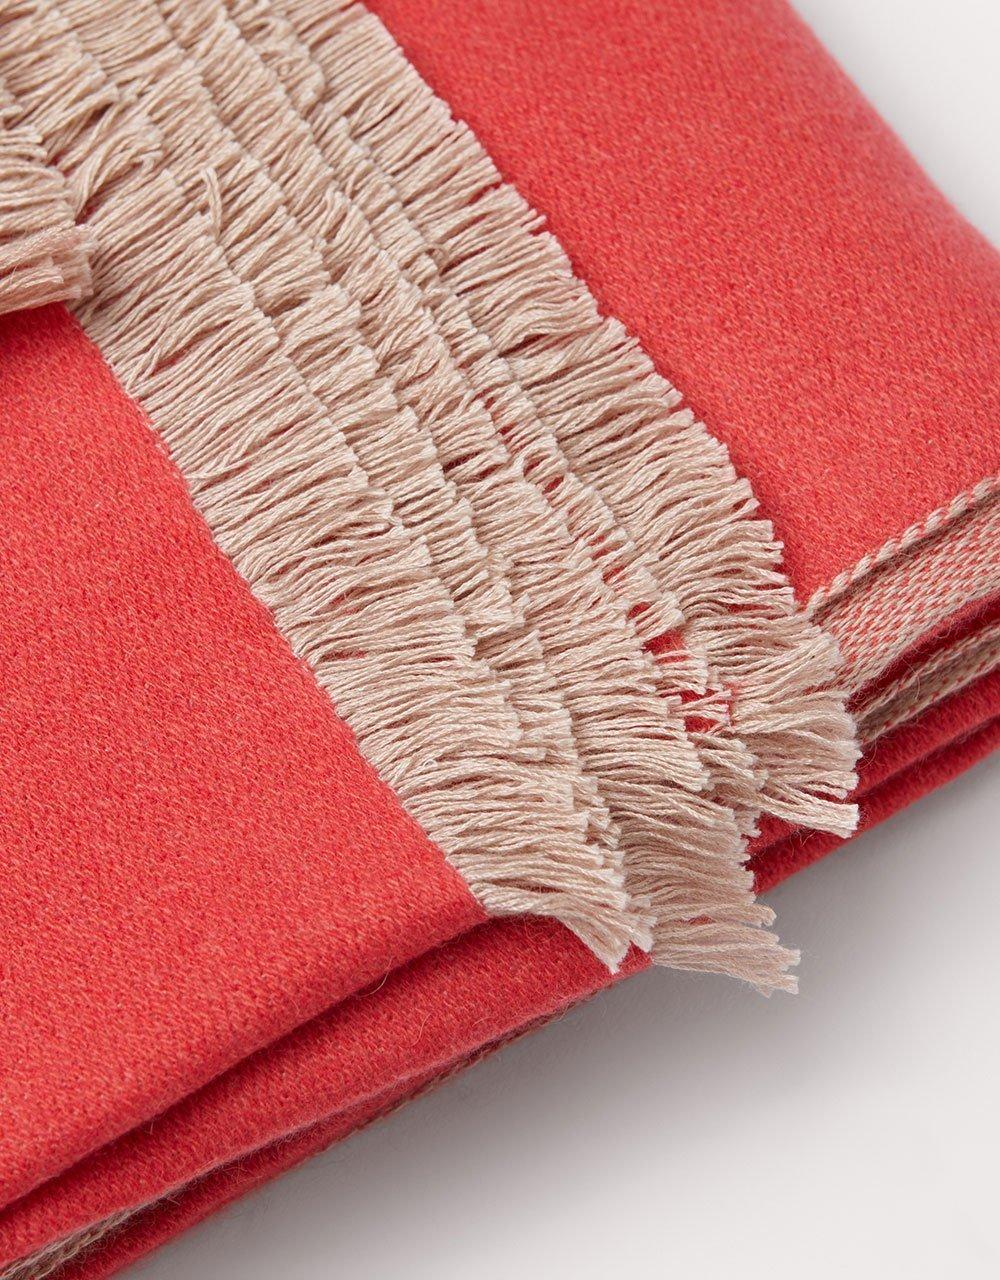 blanket01b